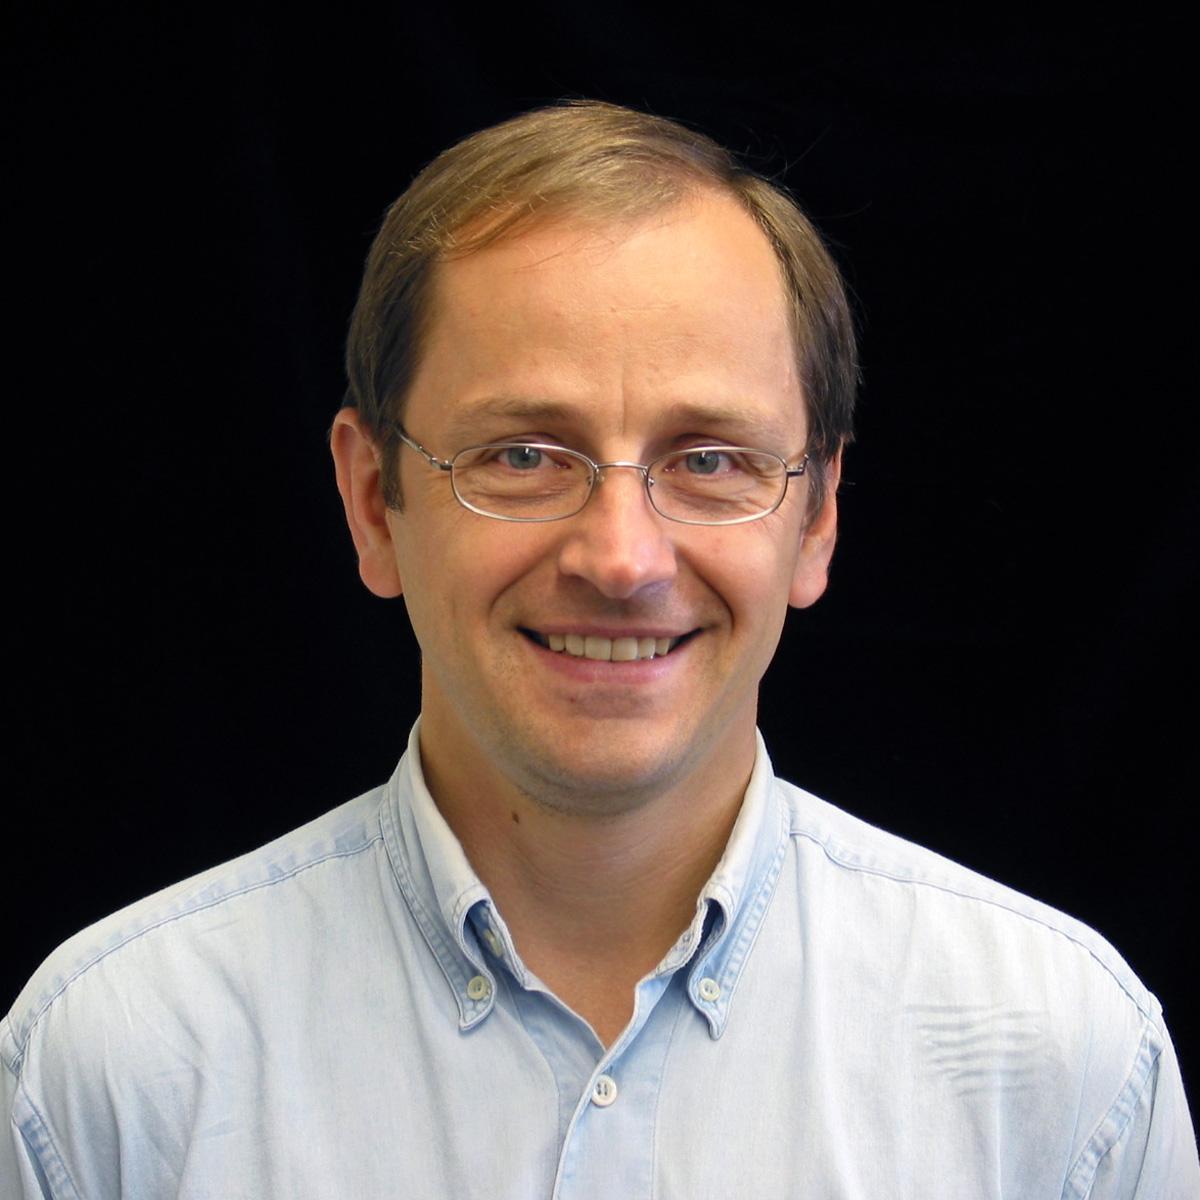 Joerg Graf